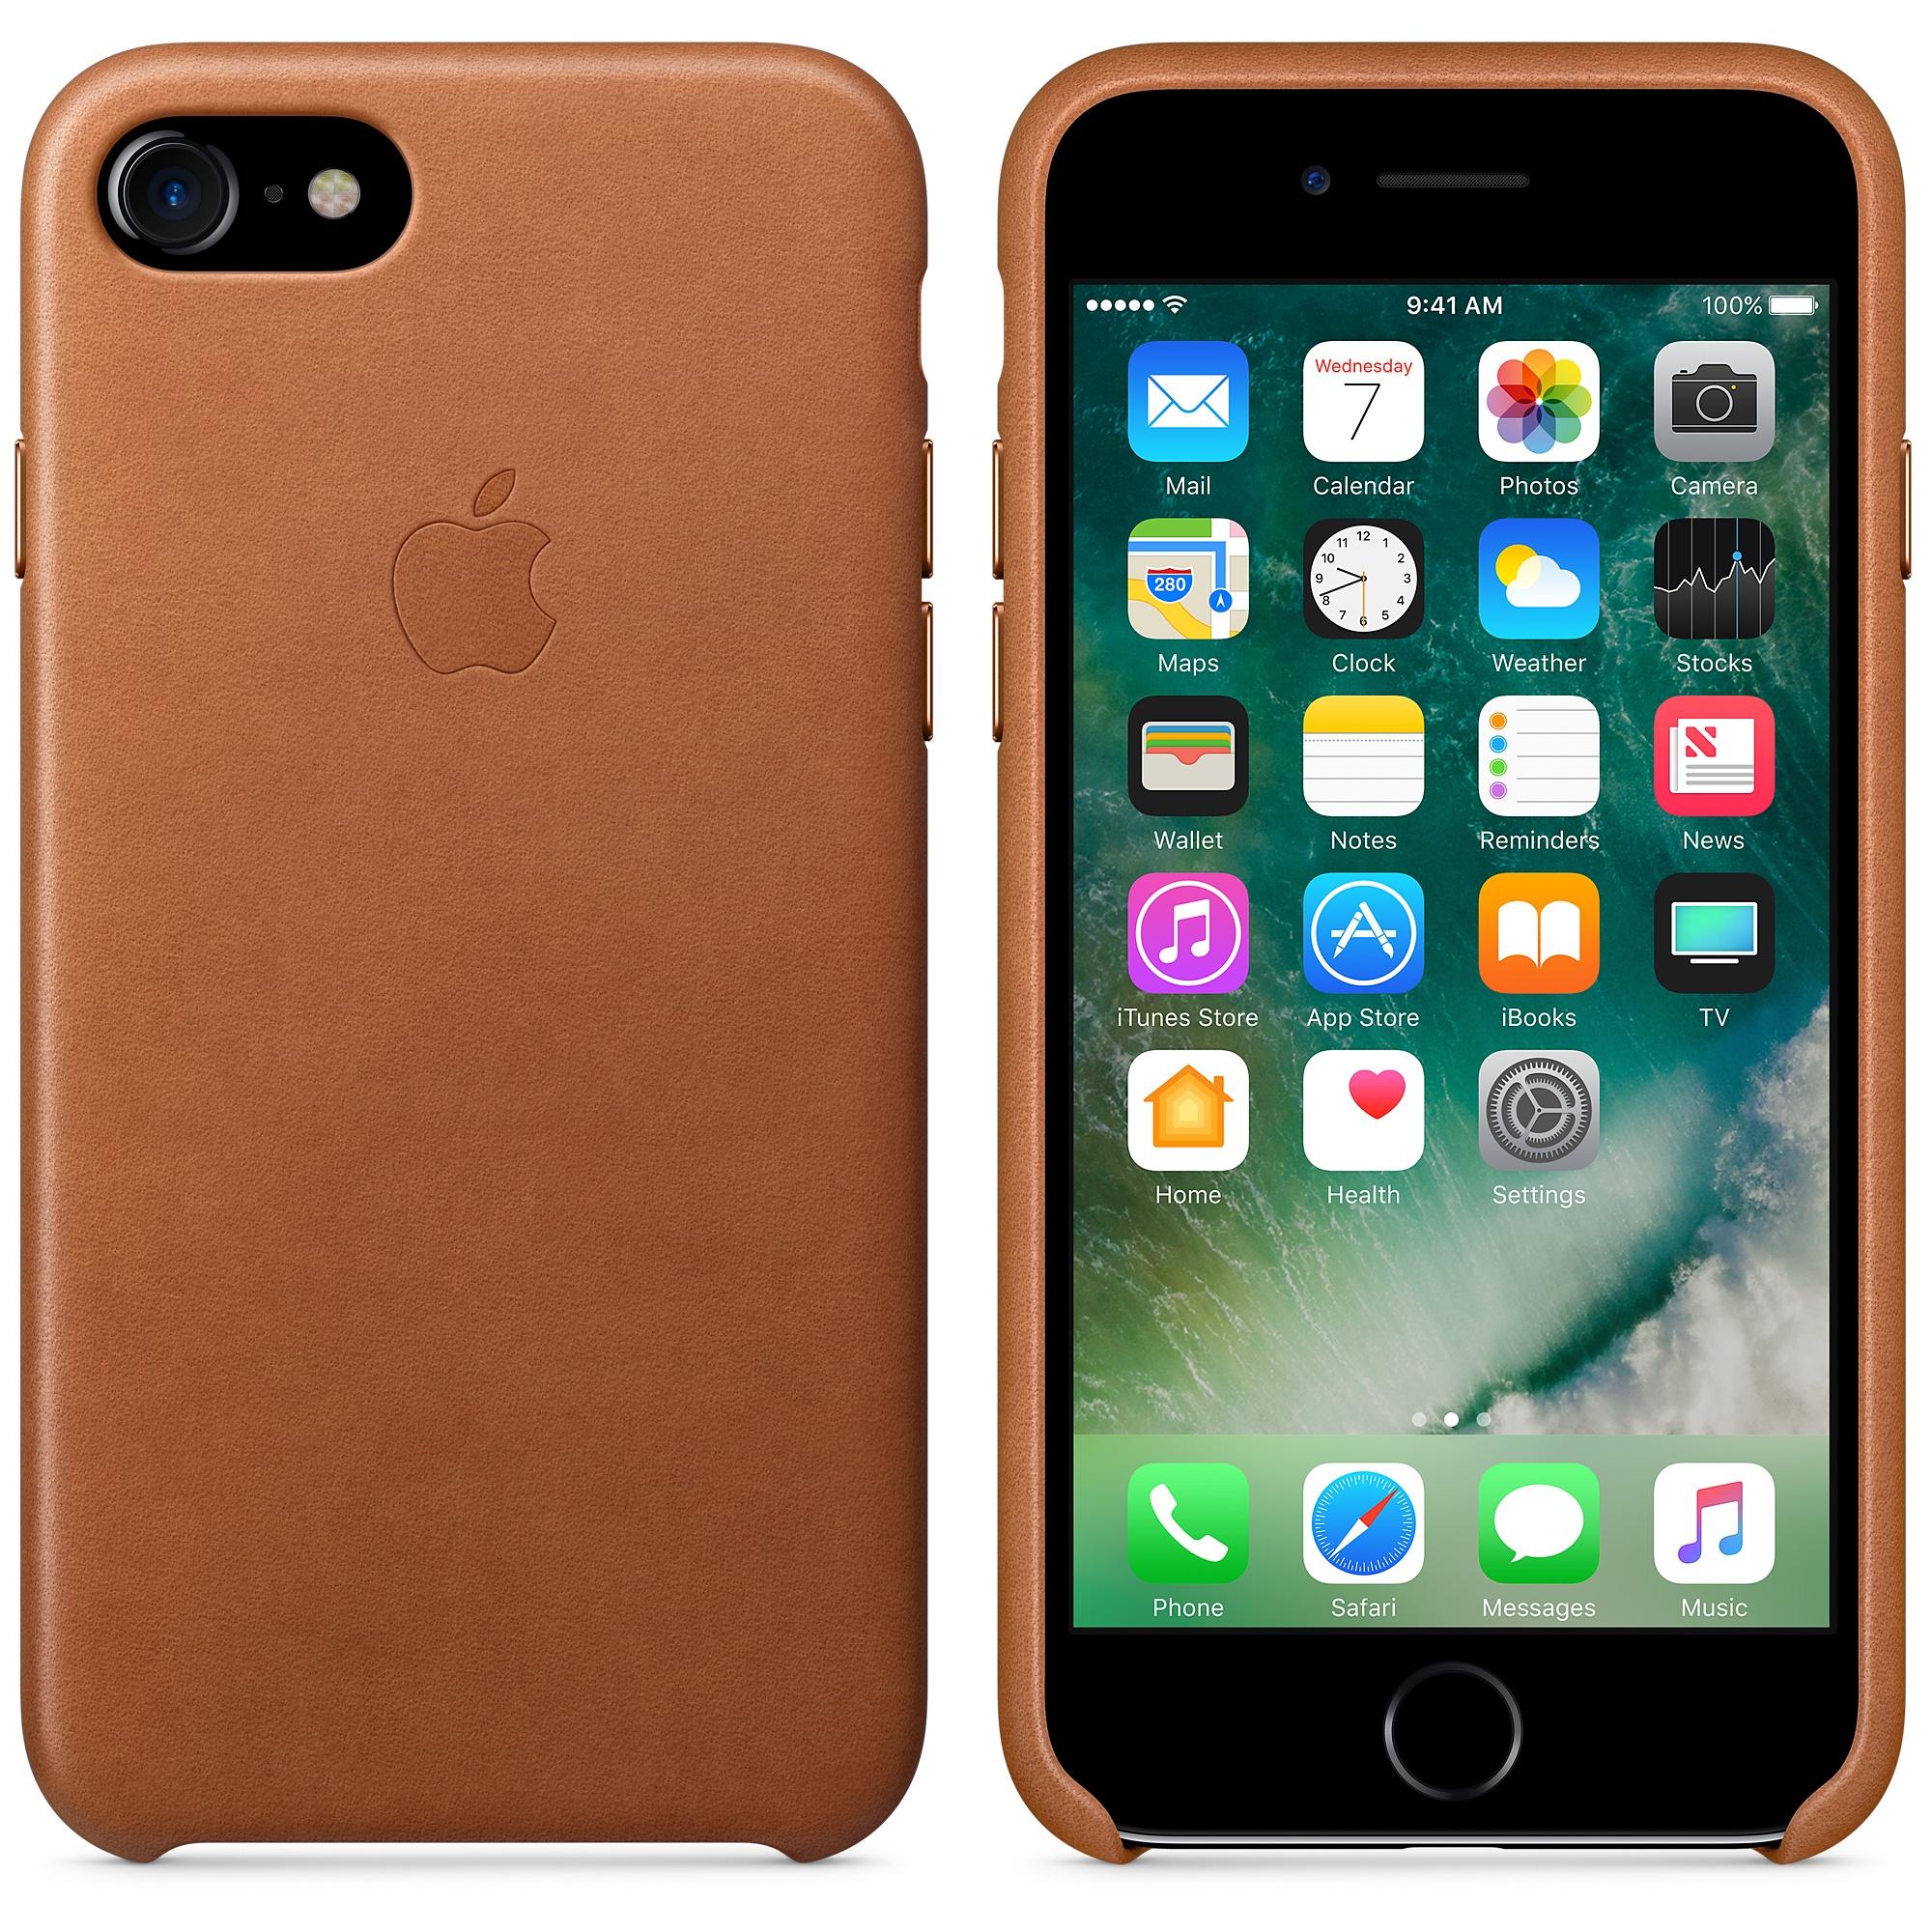 Pouzdra, kryty a obaly na Apple iPhone 7